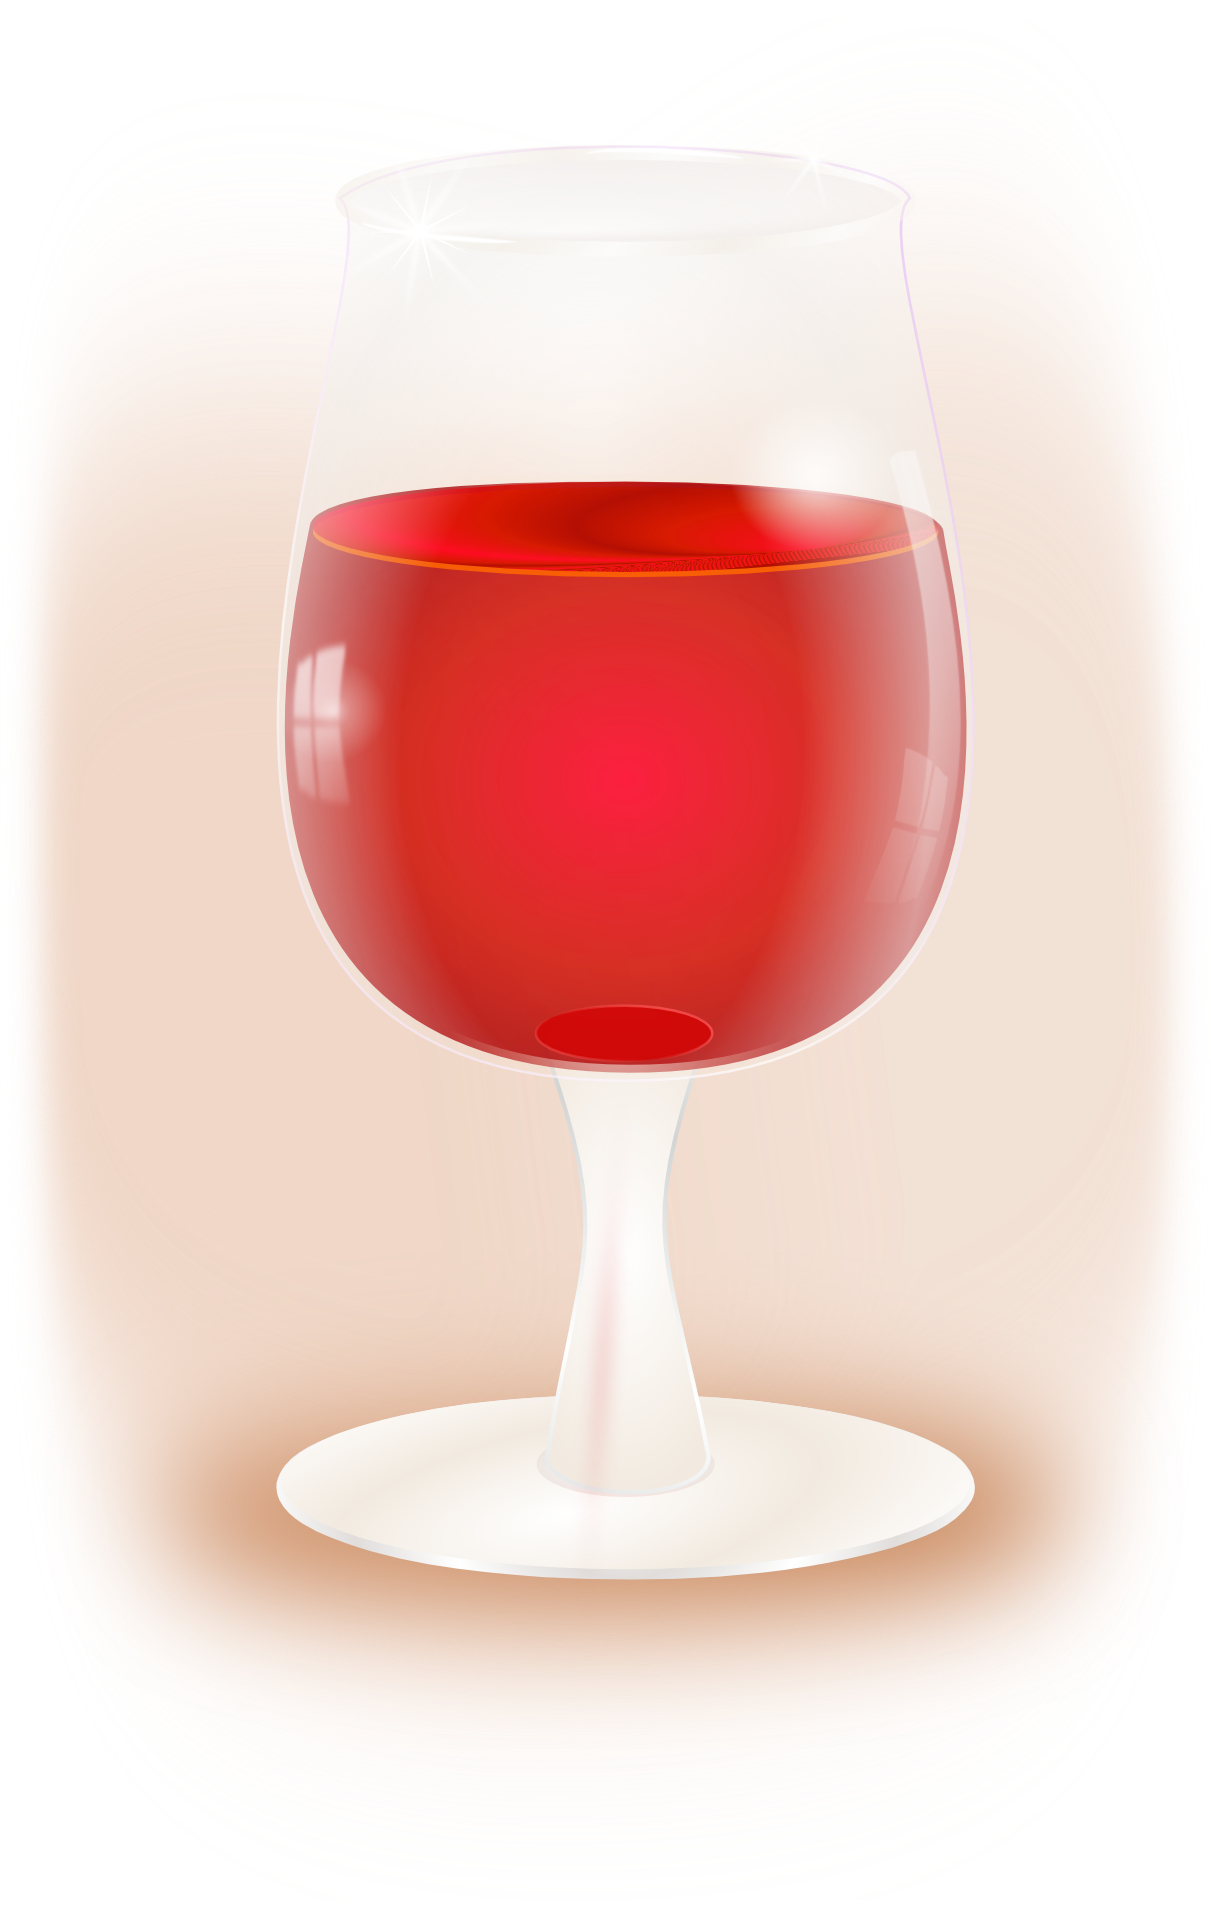 Glass cup,red wine,dirnk,mug,beverage vector